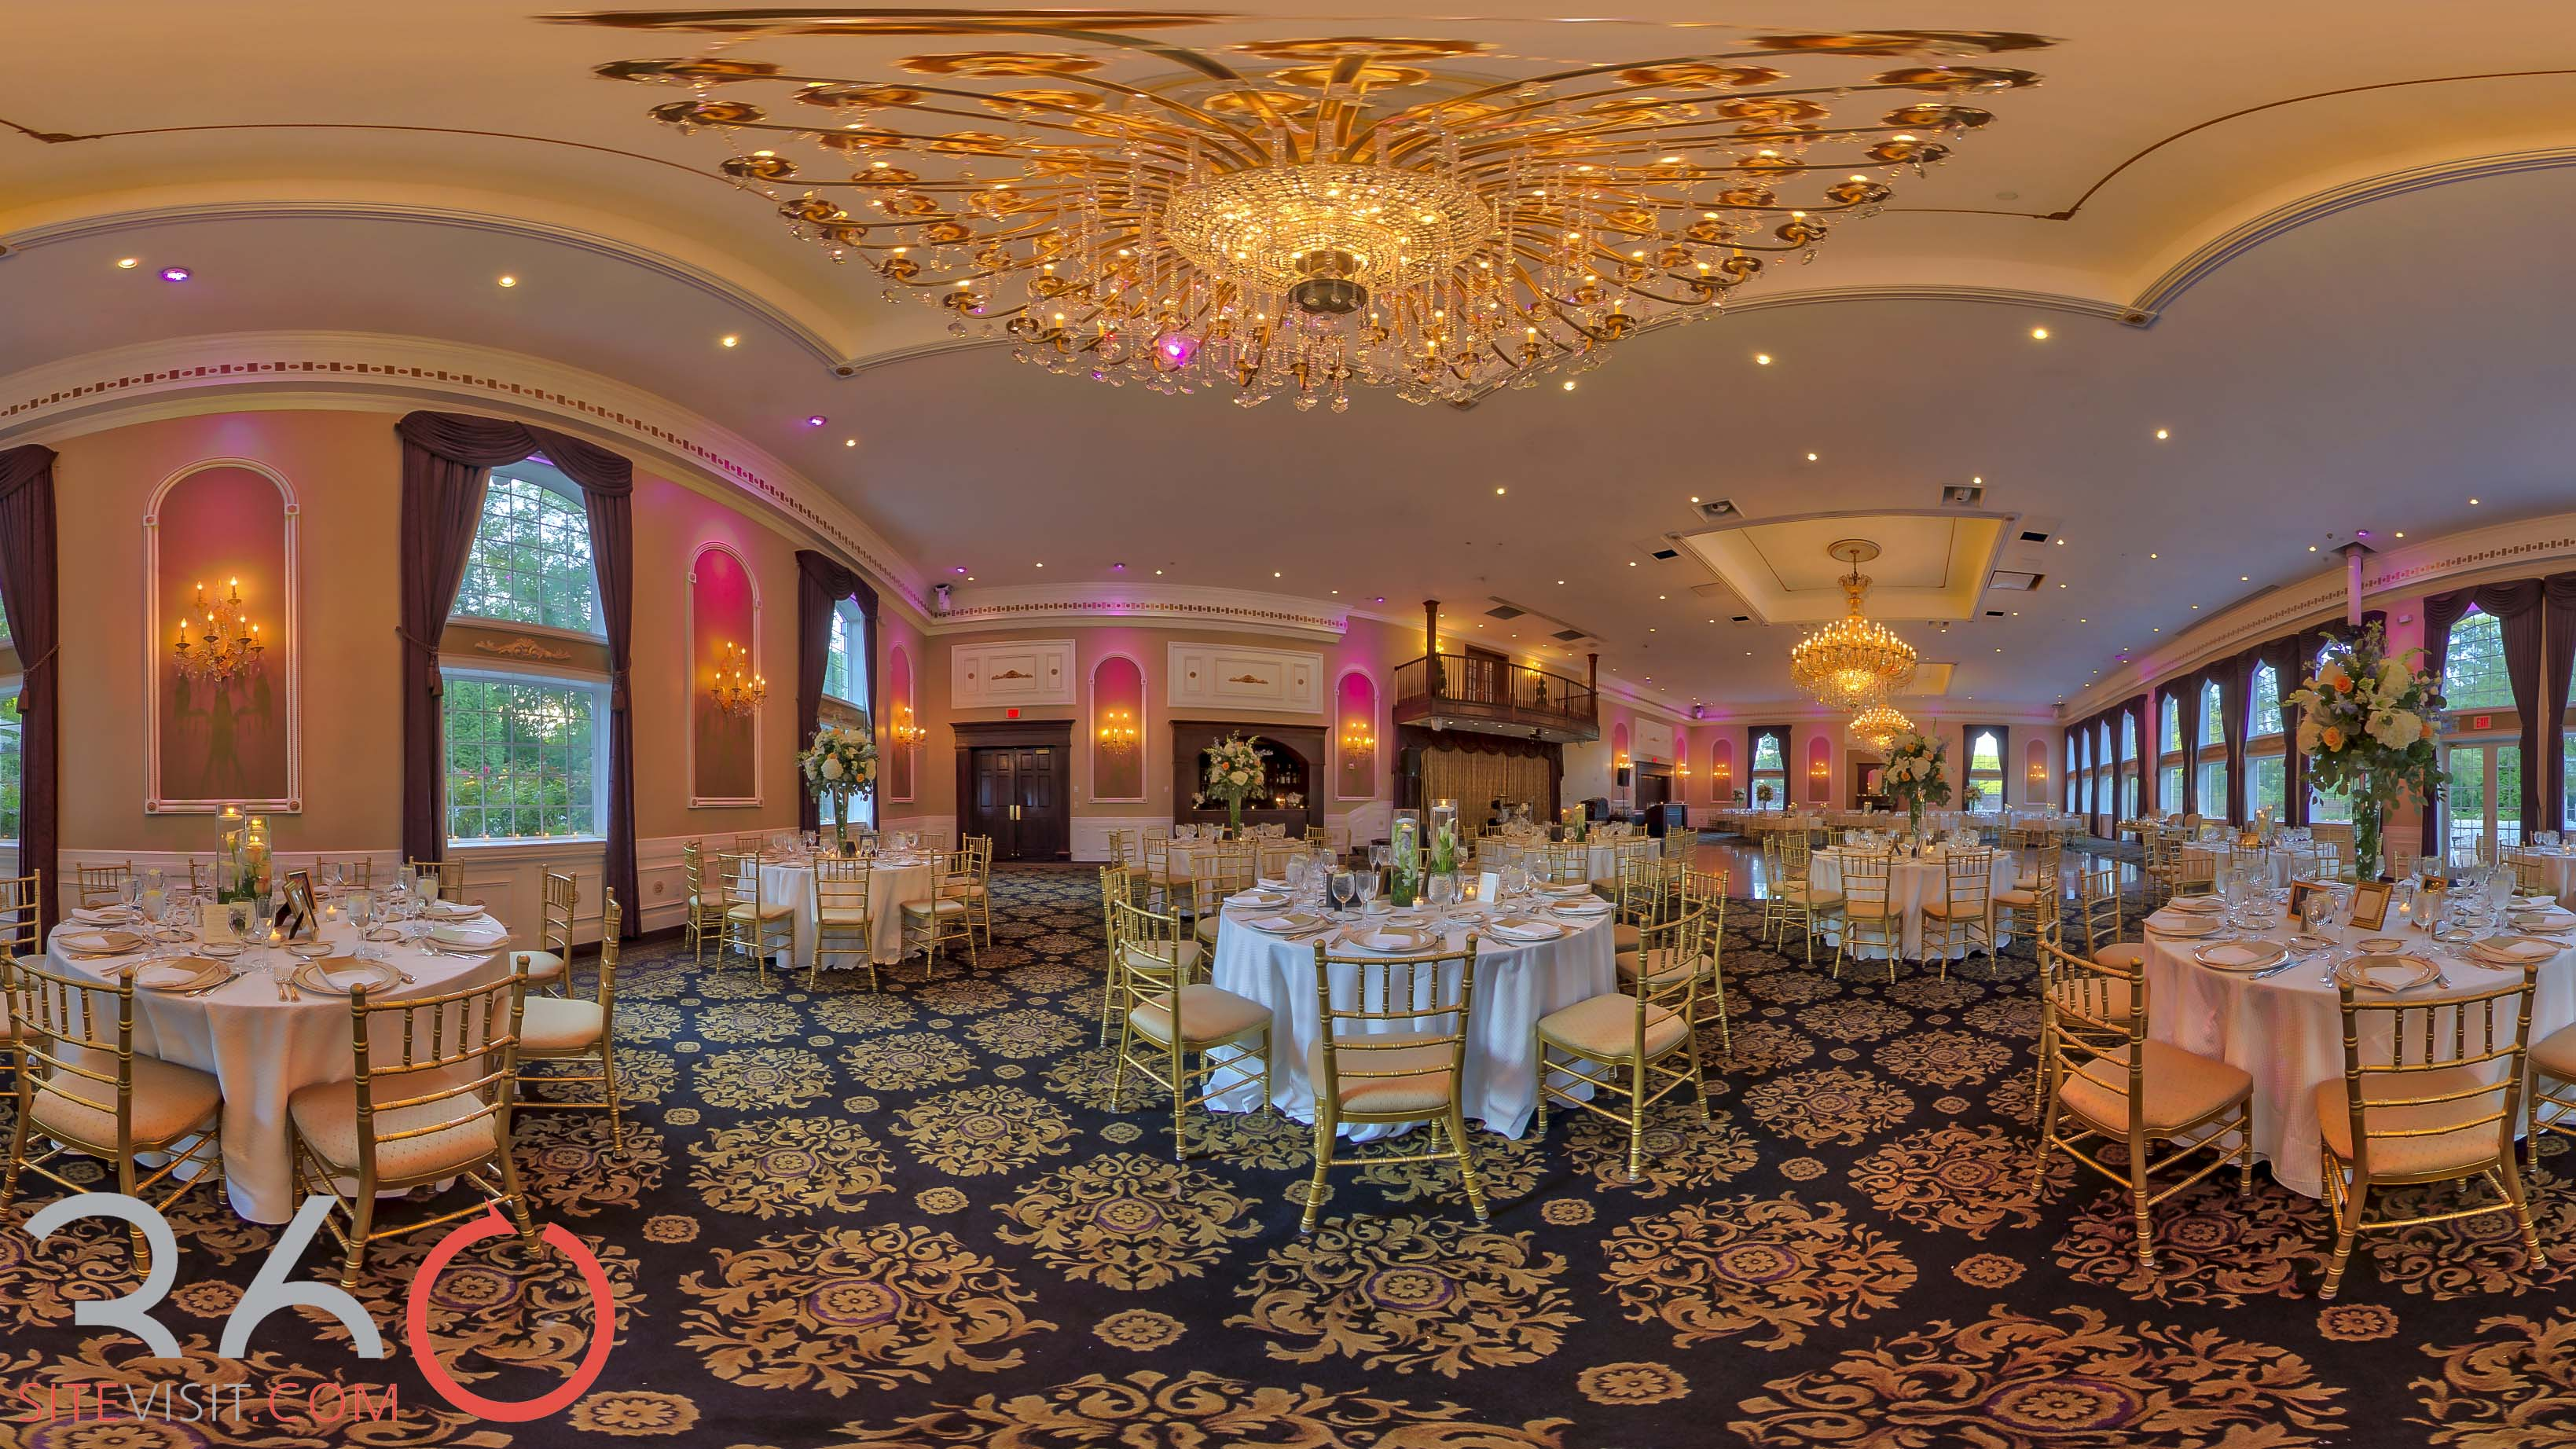 Estate At Florentine Gardens Wedding Venue Virtual Tour 360sitevisit